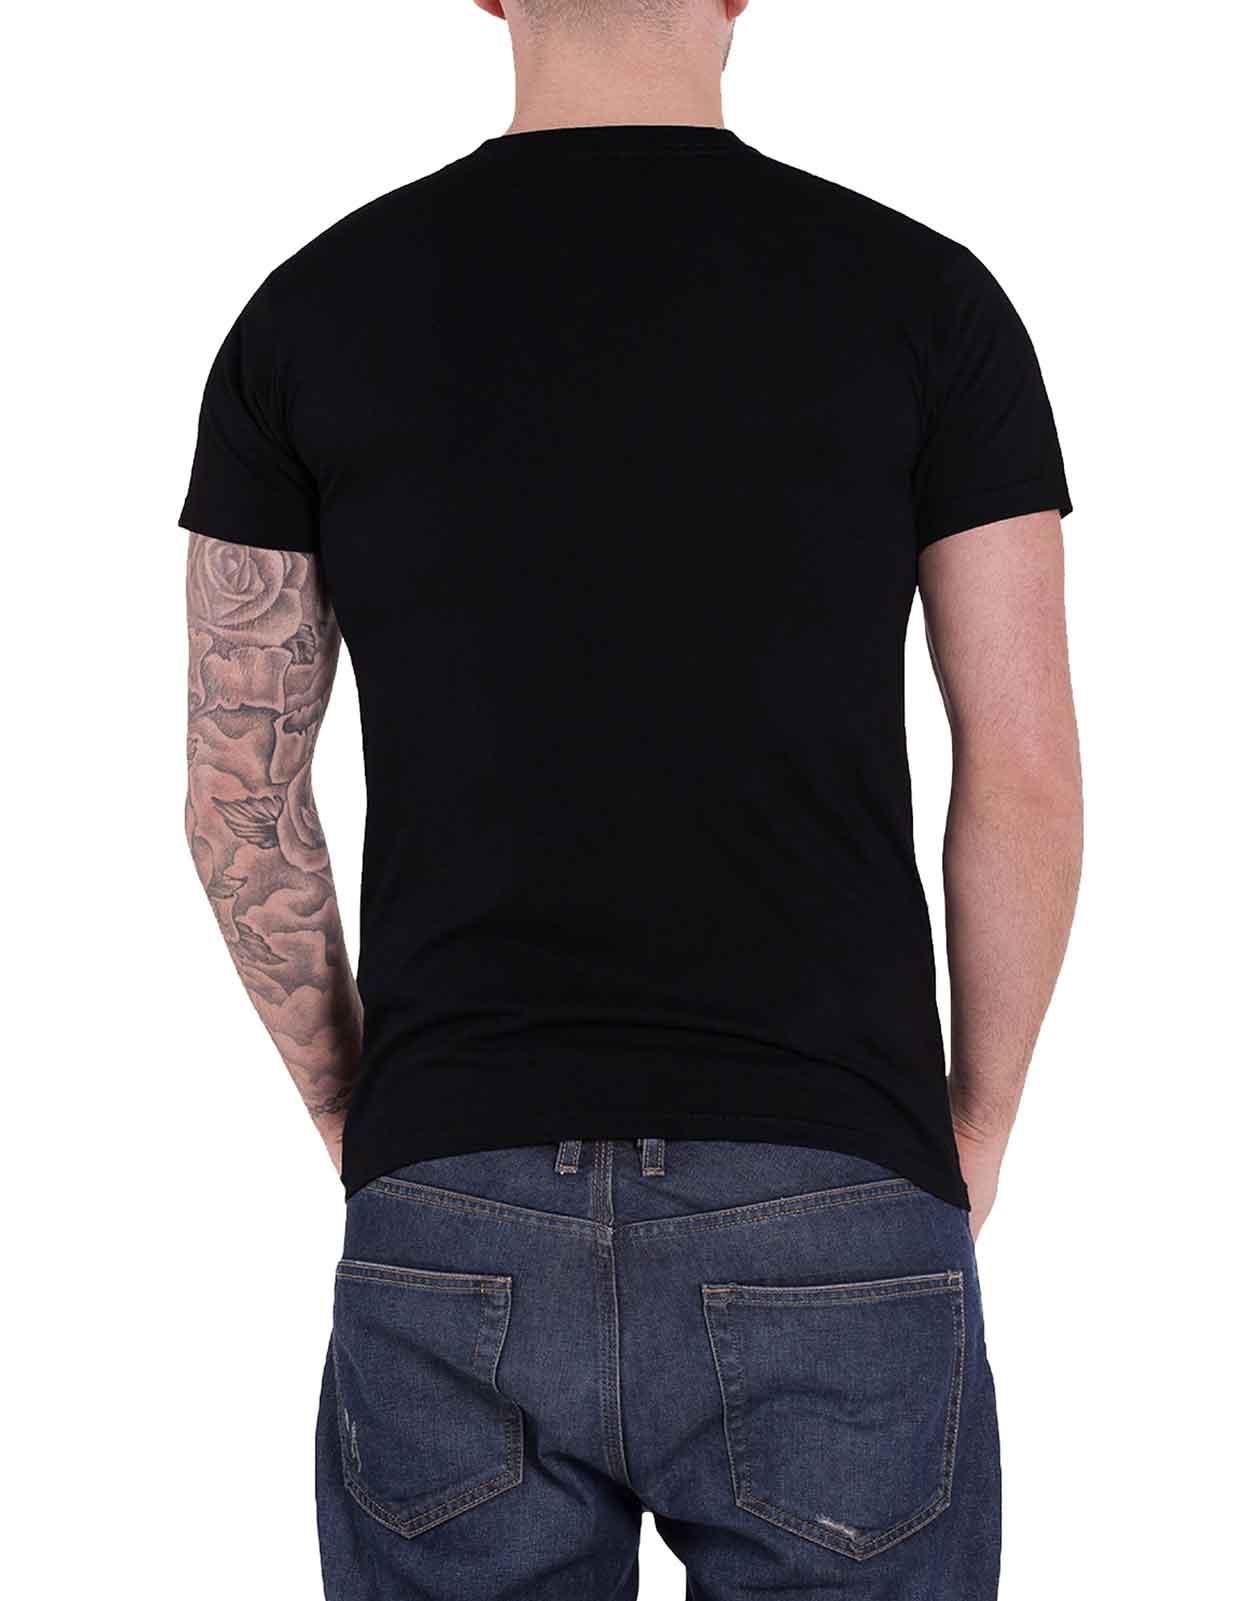 Officiel-Jimi-Hendrix-T-Shirt-Purple-Haze-Are-you-experienced-Logo-Homme-NEUF miniature 29